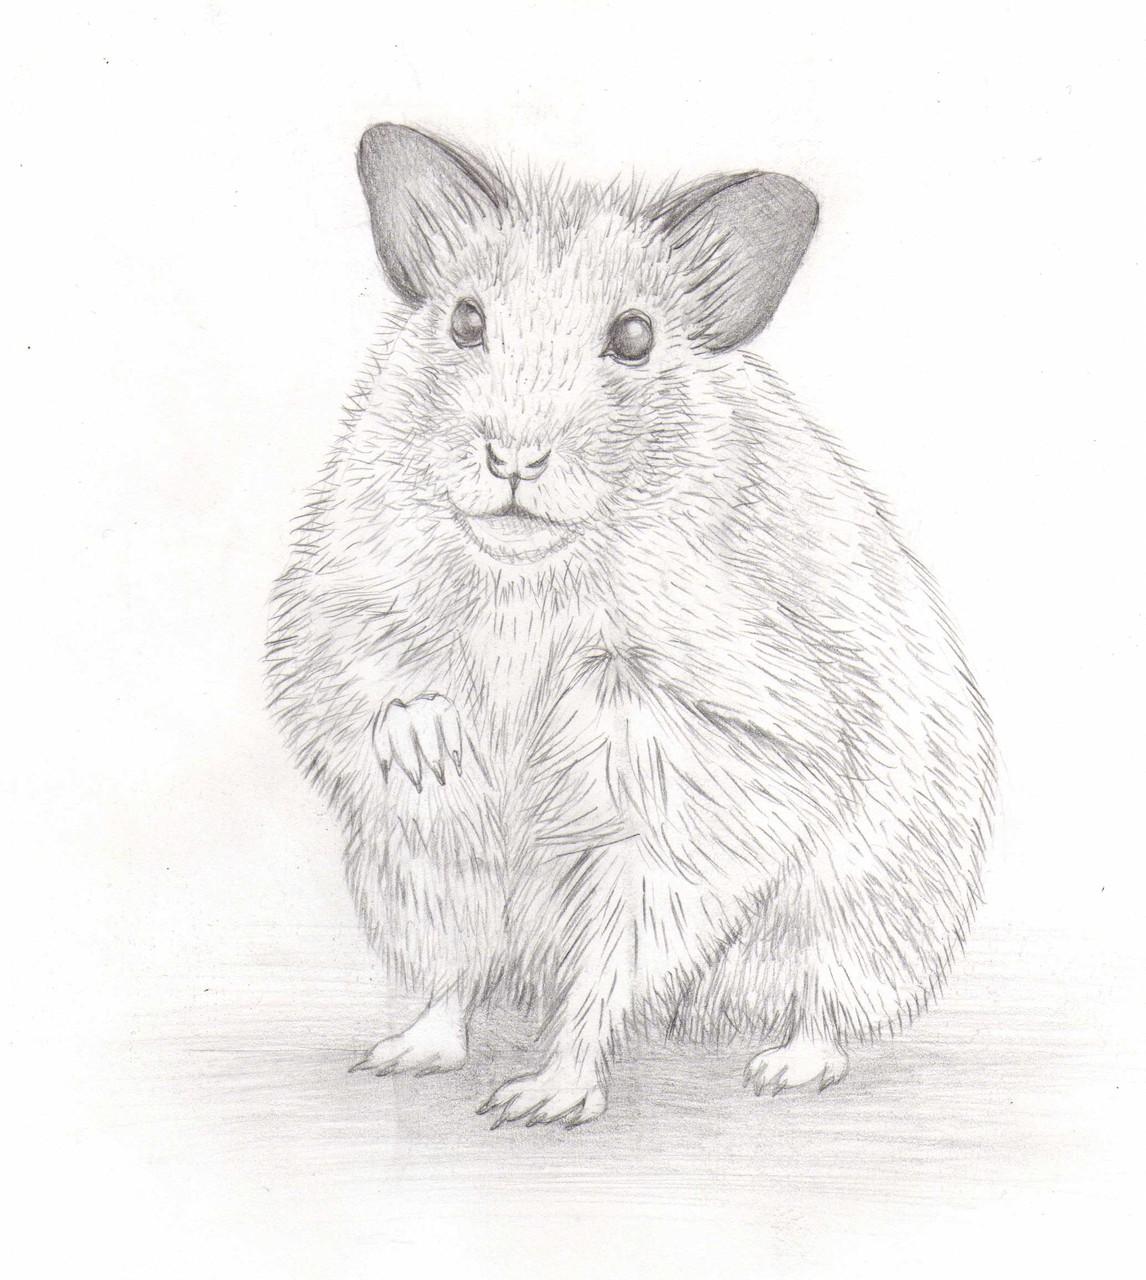 Dessins sur Feuille > Hamster